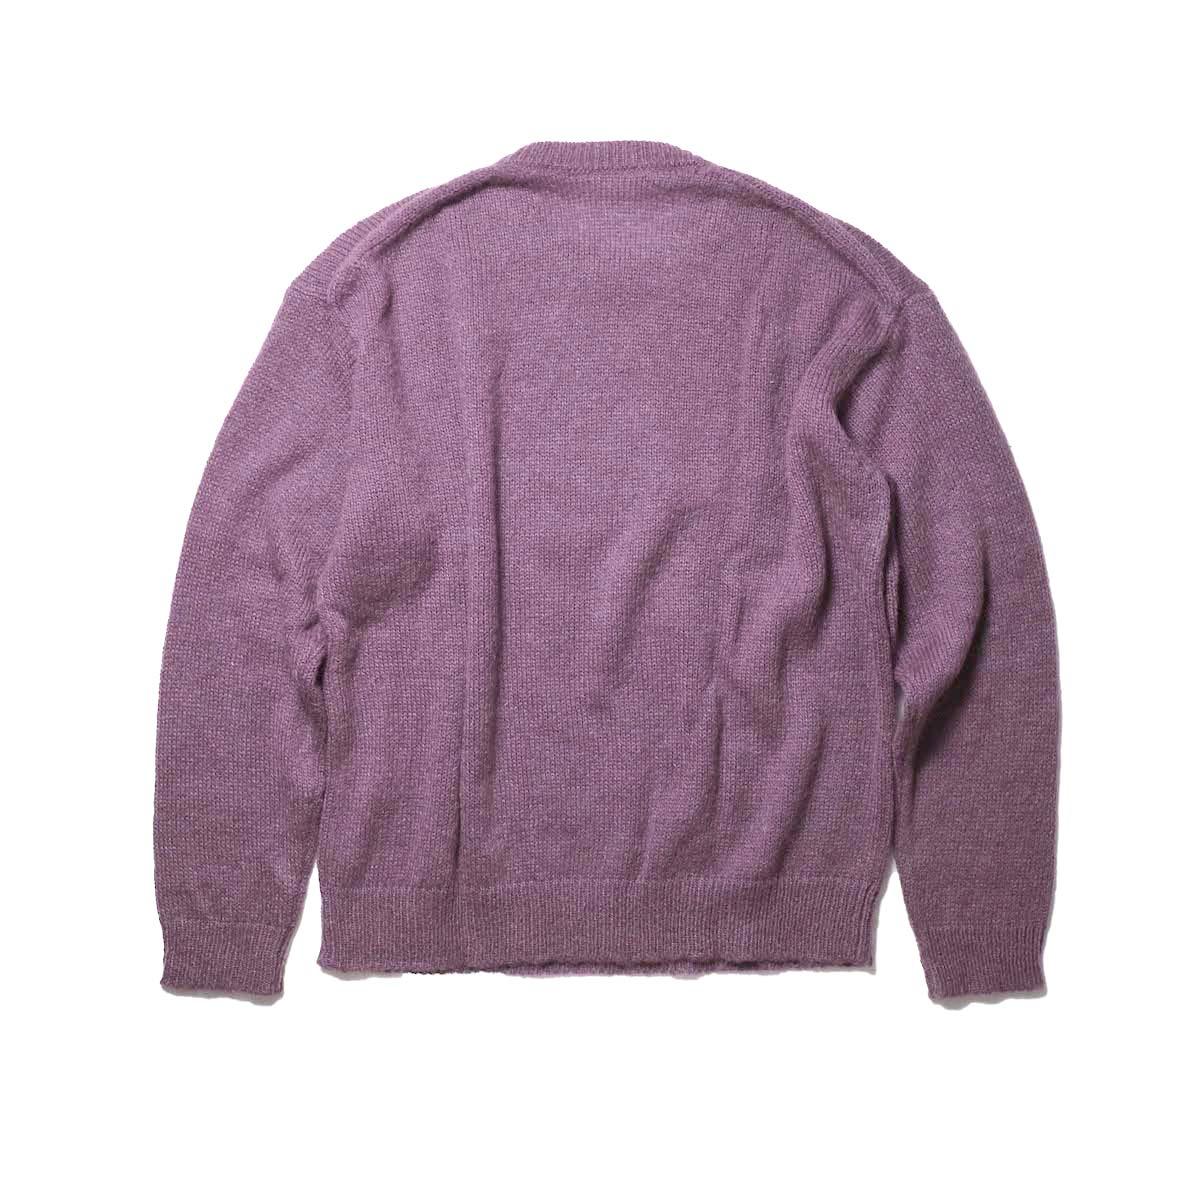 FLAMAND / Mohair Basic (Dark Lavender)背面